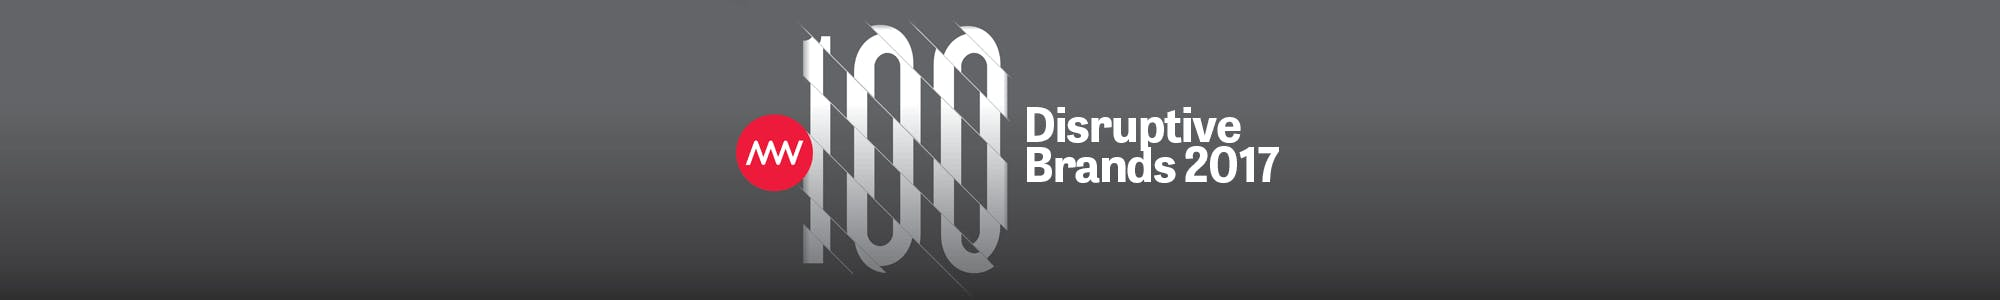 100 Disruptive Brands 2017